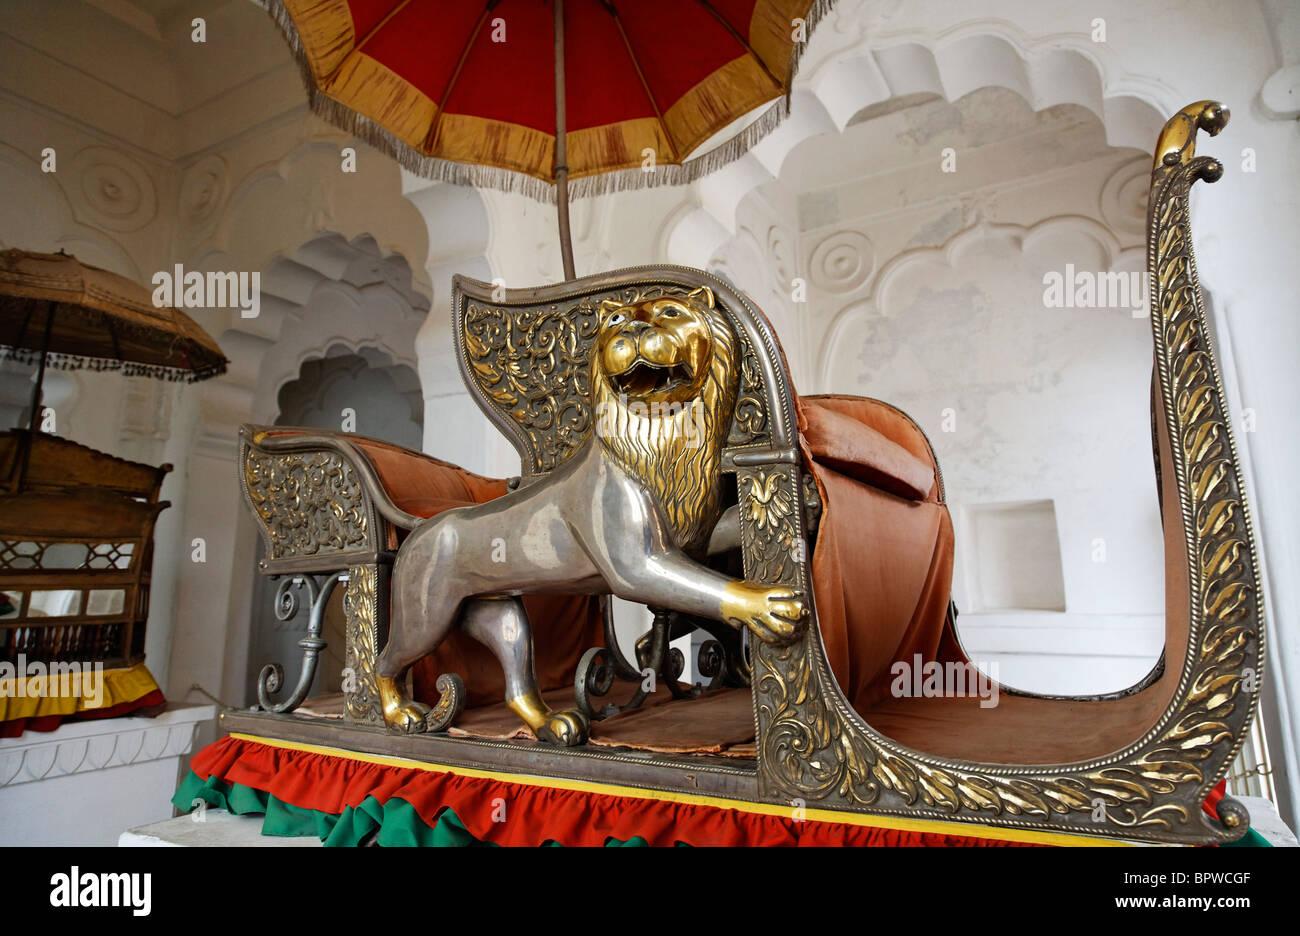 Royal howdah inside Meherangarh Fort, Jodhpur, Rajasthan, India - Stock Image